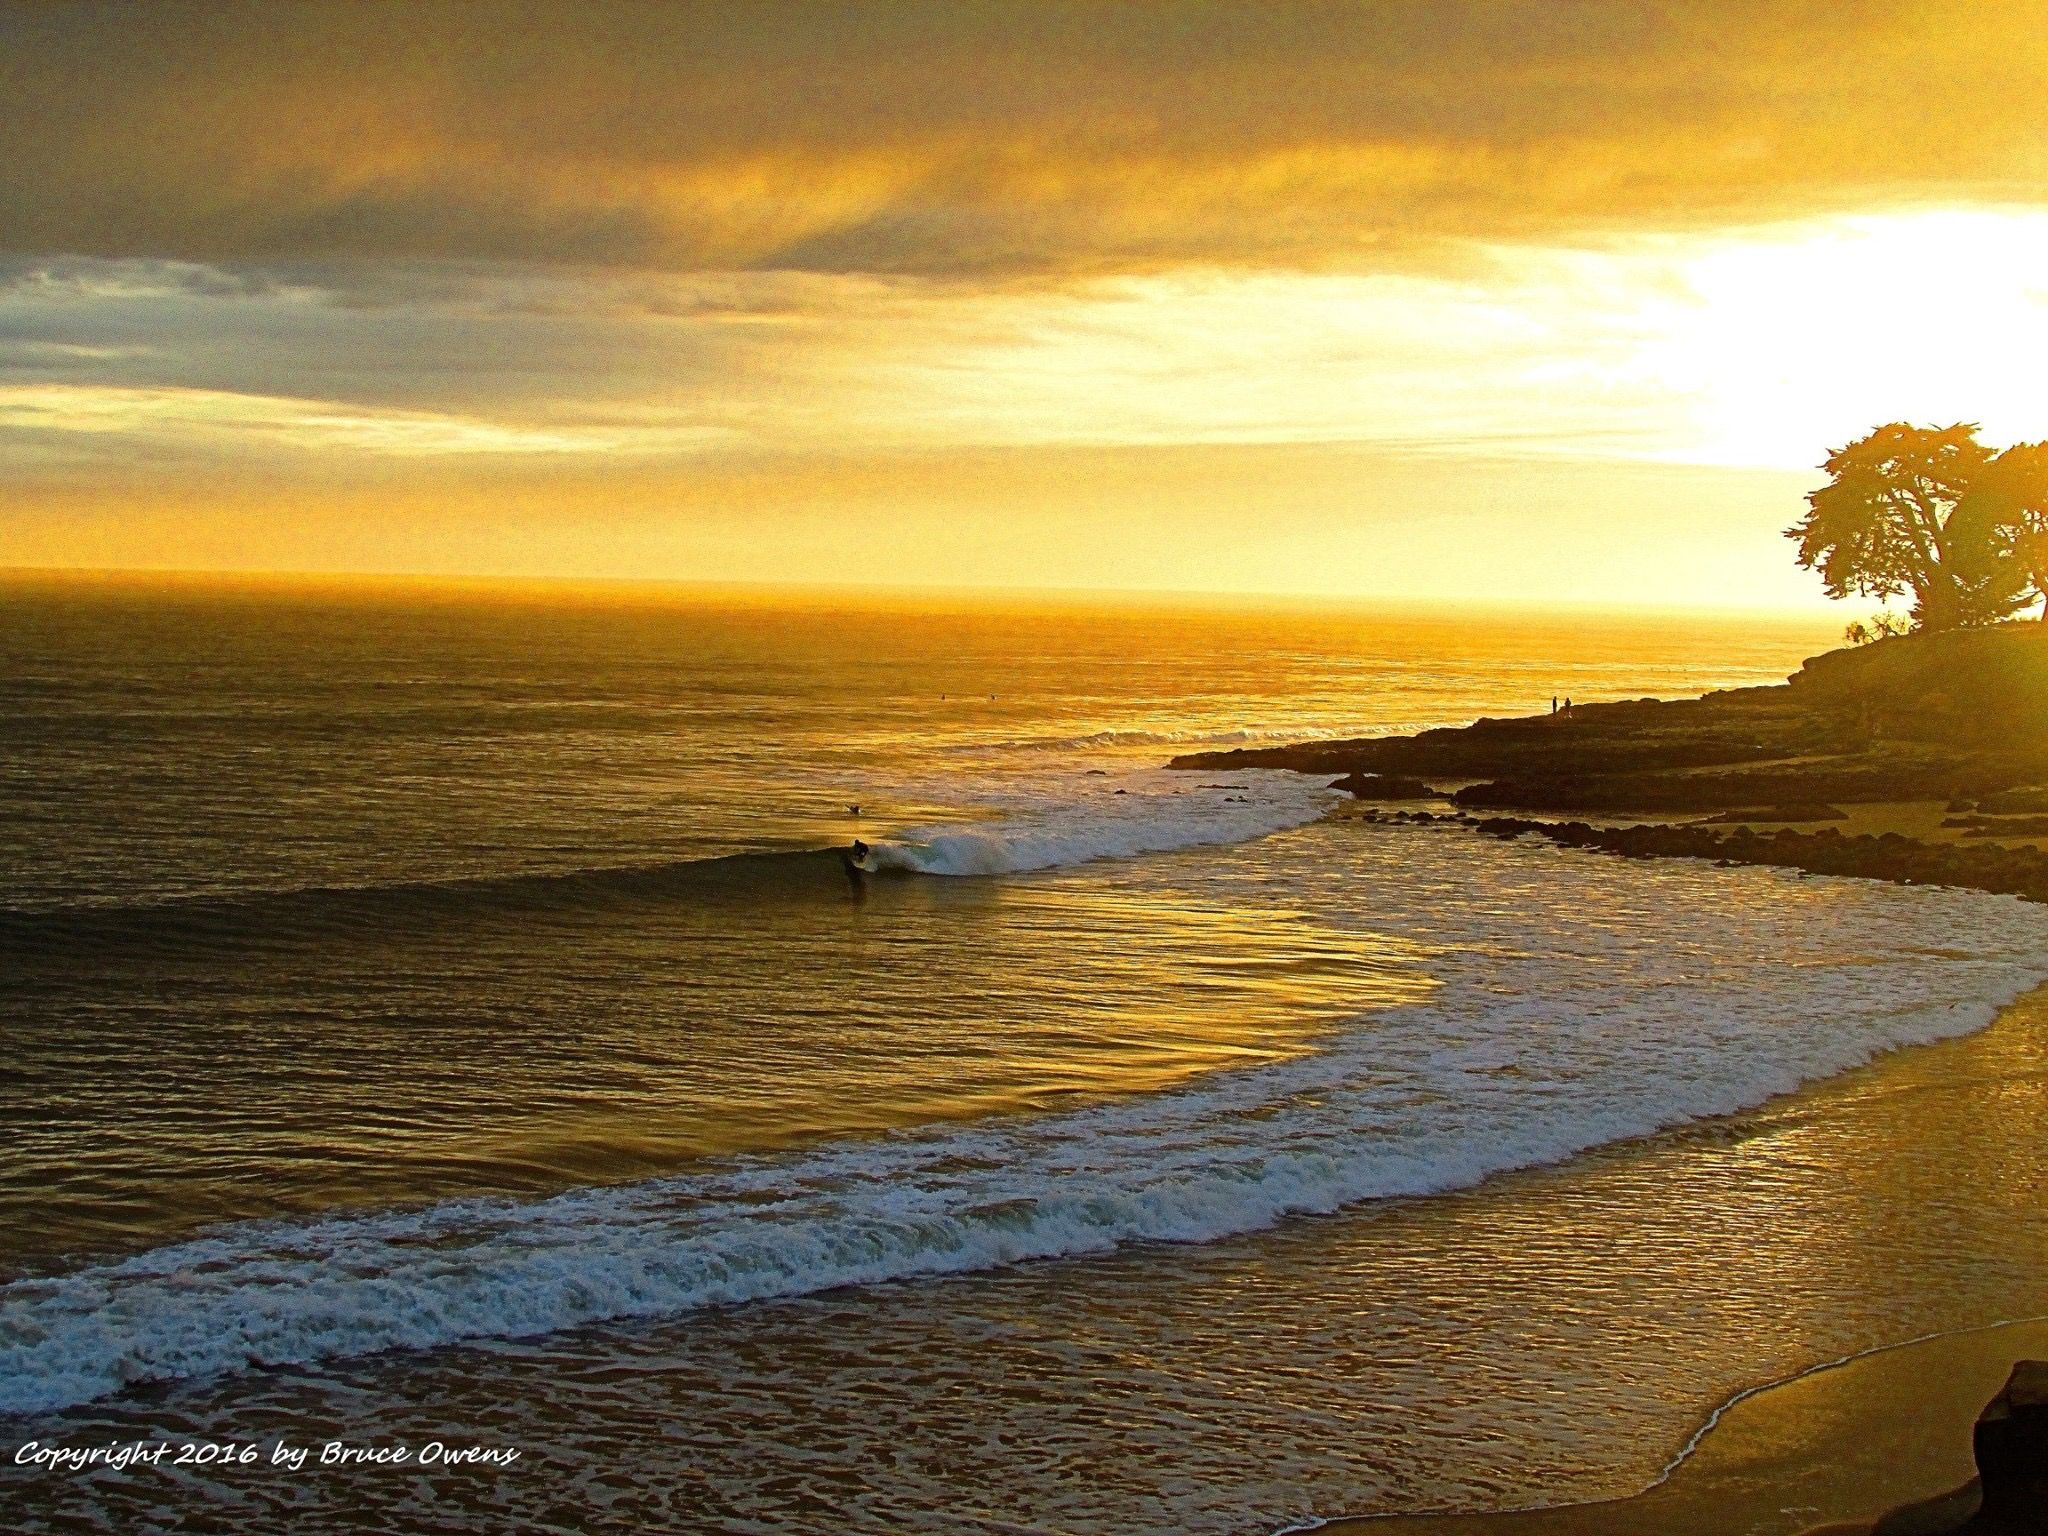 Pin by Sherri Vultaggio on Santa Cruz county....home | Pinterest ...